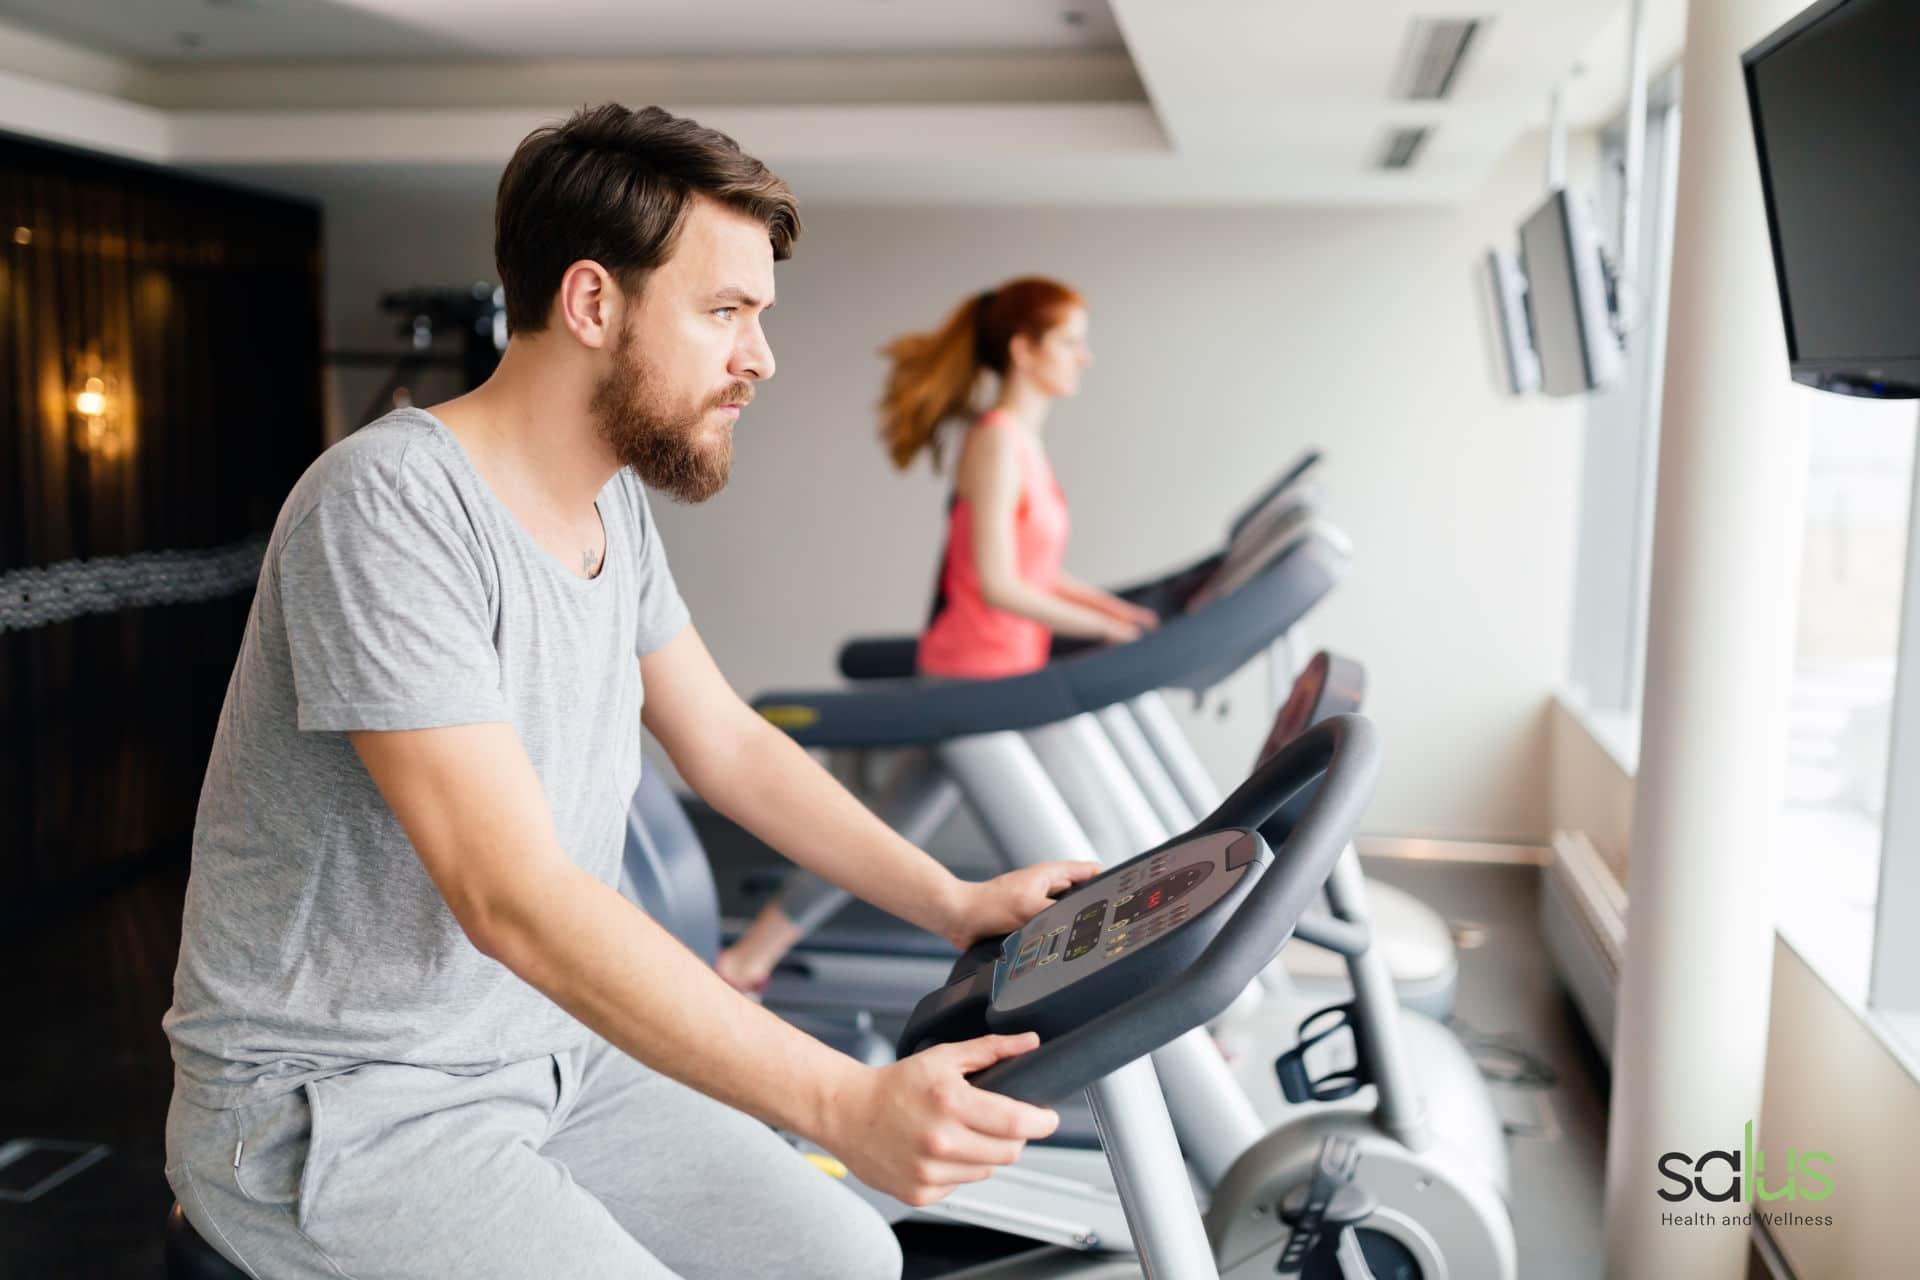 salus-blog-sport-per-accelerare-il-metabolismo